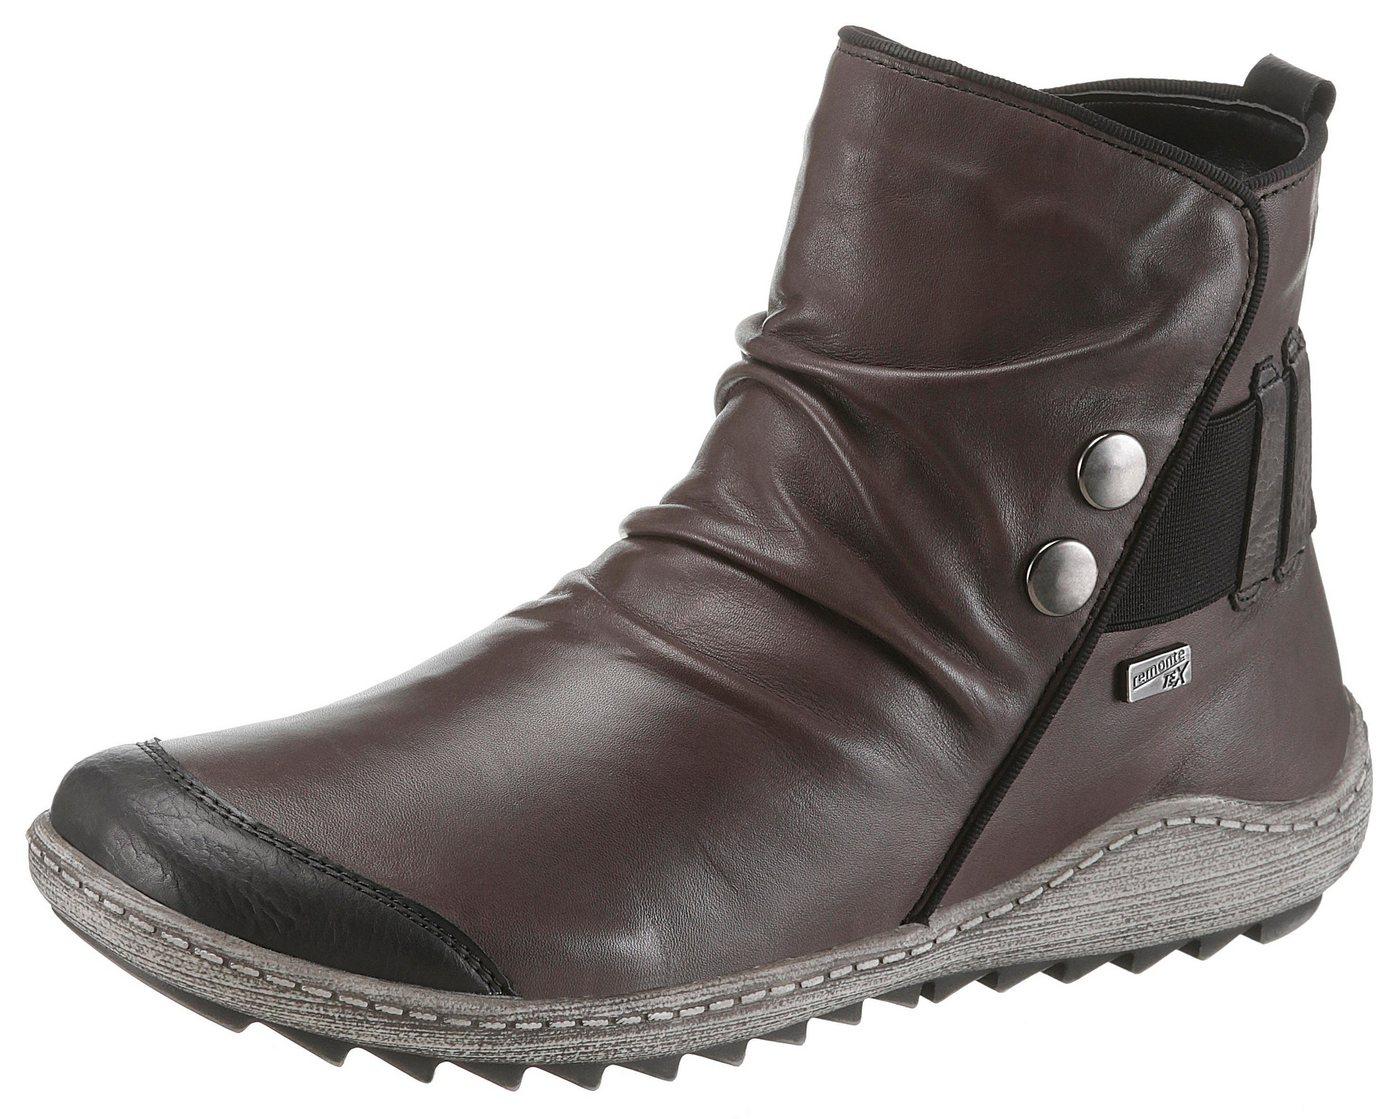 Remonte Winterboots mit Tex-Membrane | Schuhe > Boots > Winterboots | Grau | Remonte